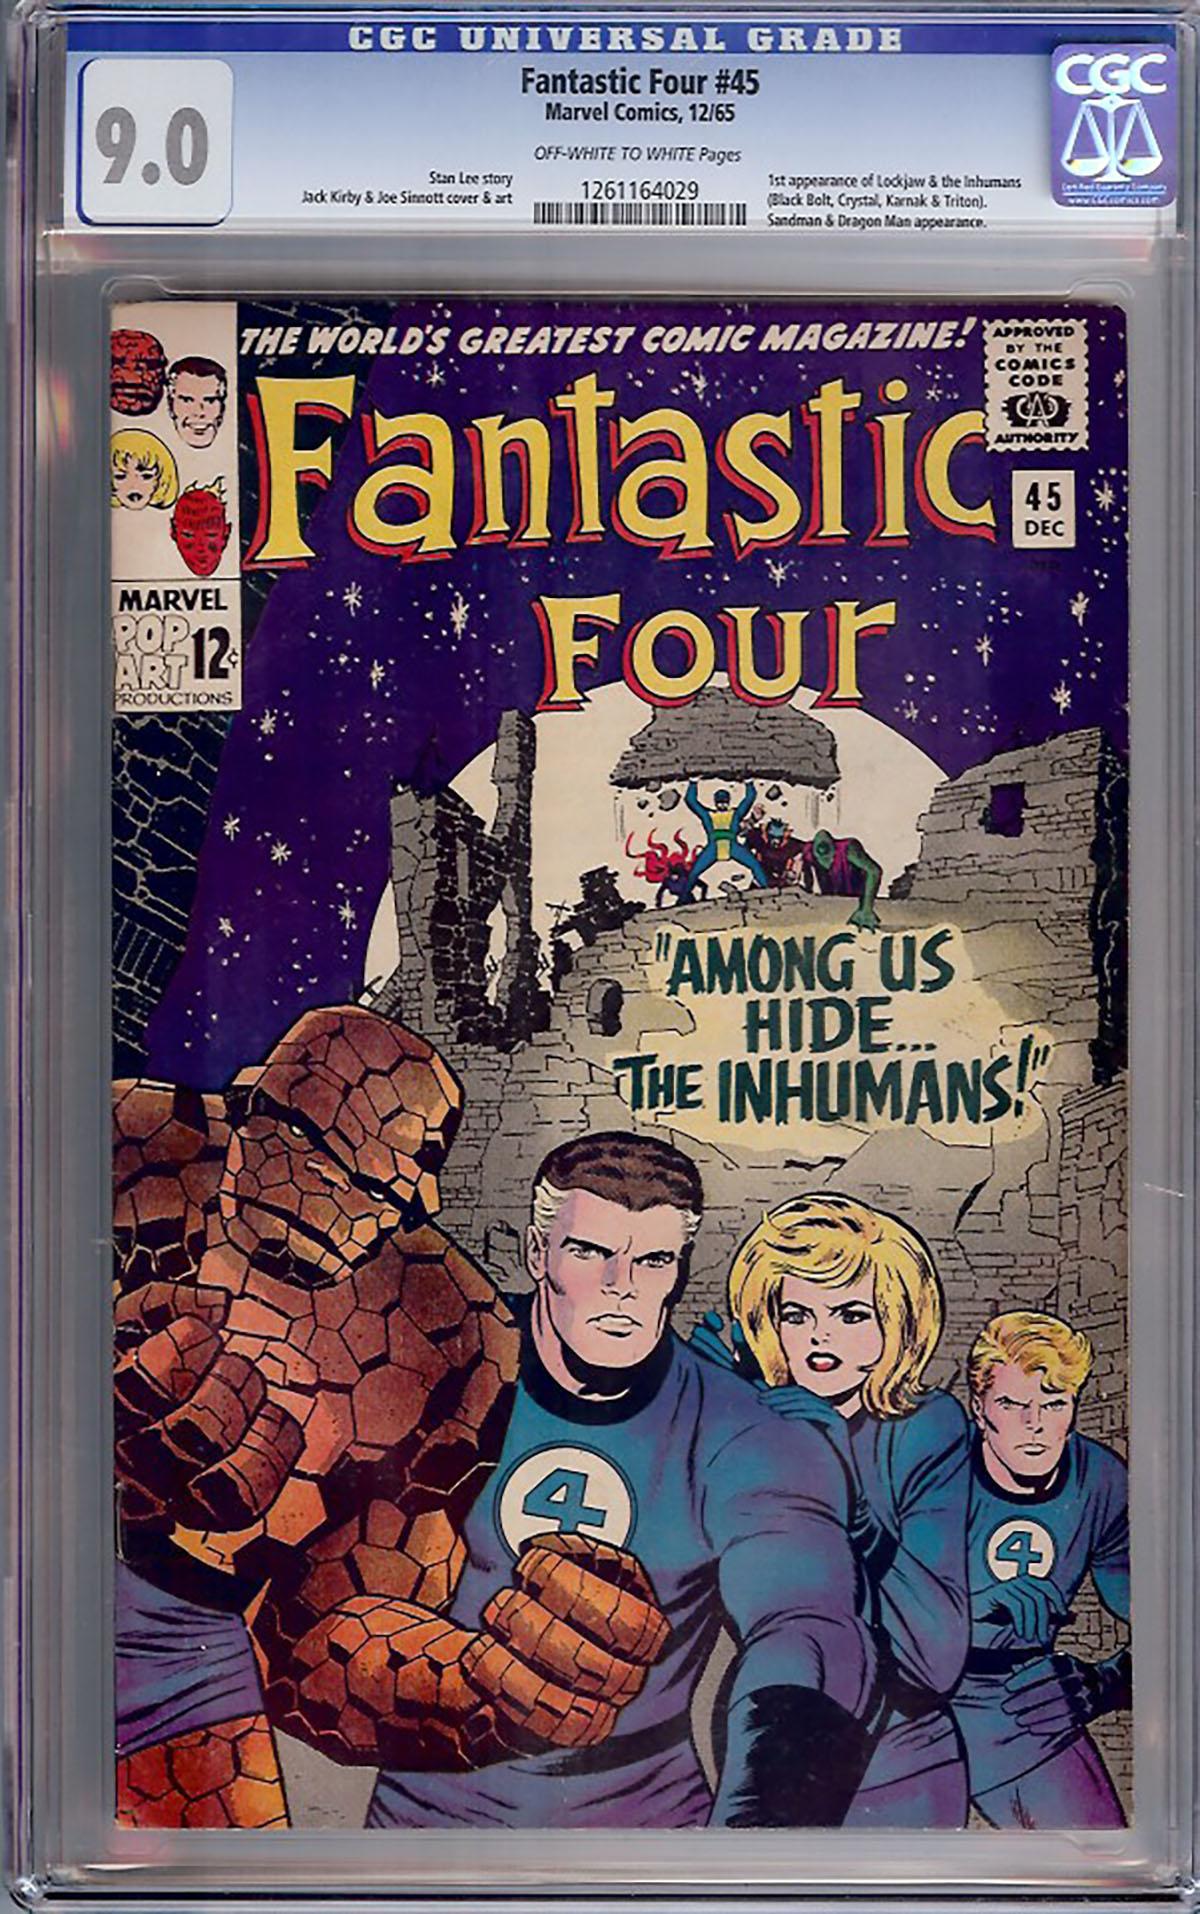 Fantastic Four #45 CGC 9.0 ow/w